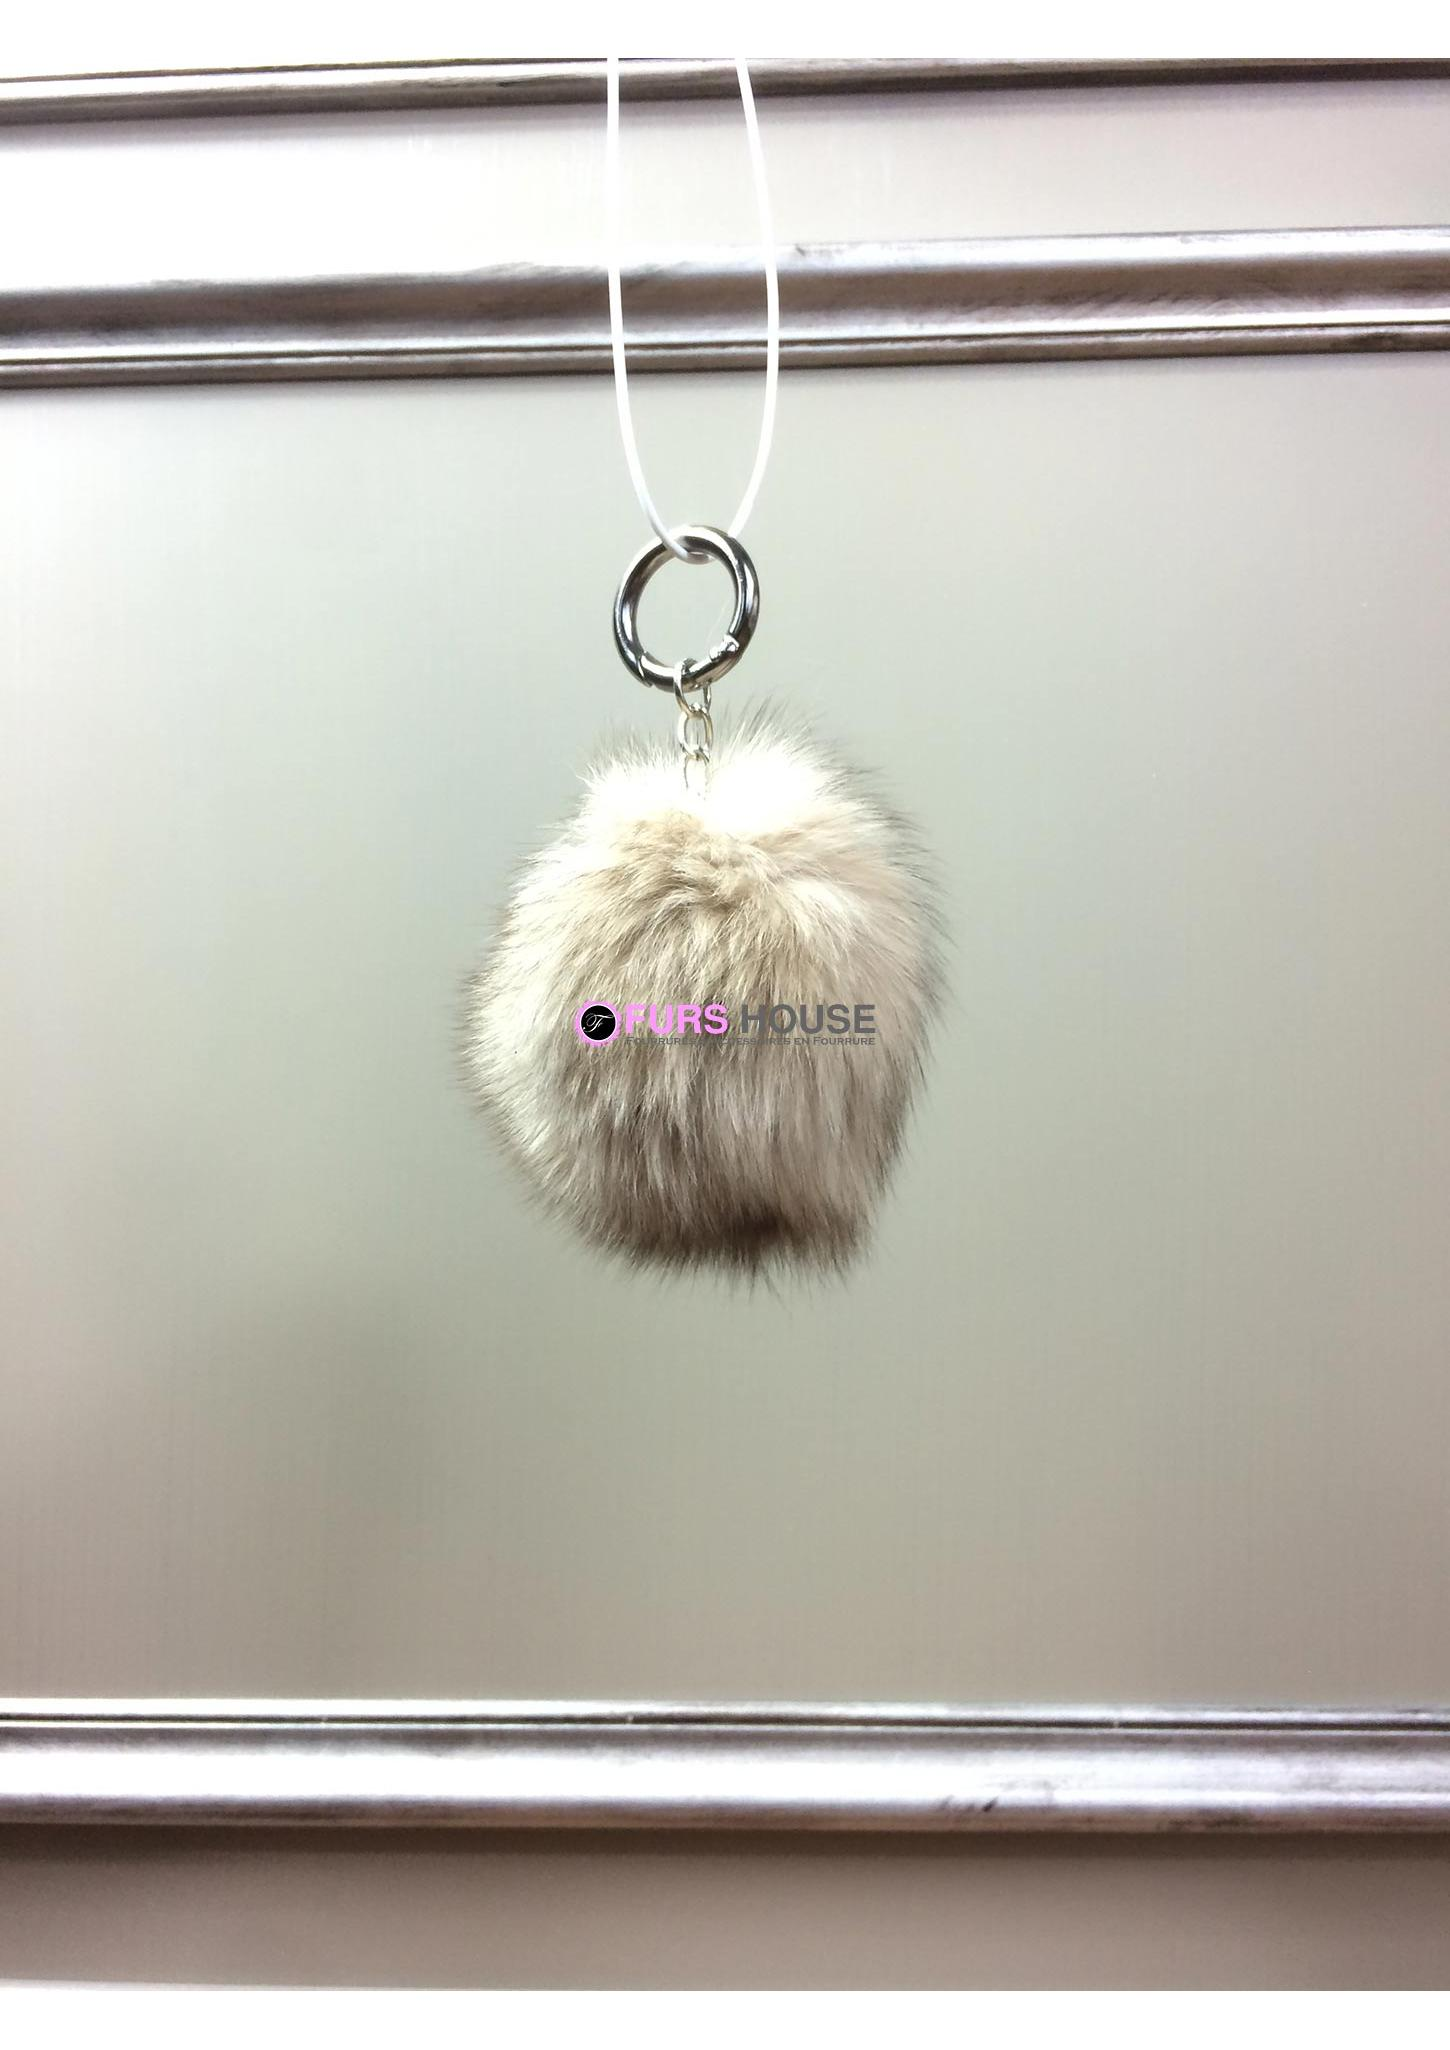 Porte-clé avec pompon en fourrure de renard - Naturel 57565e5e048